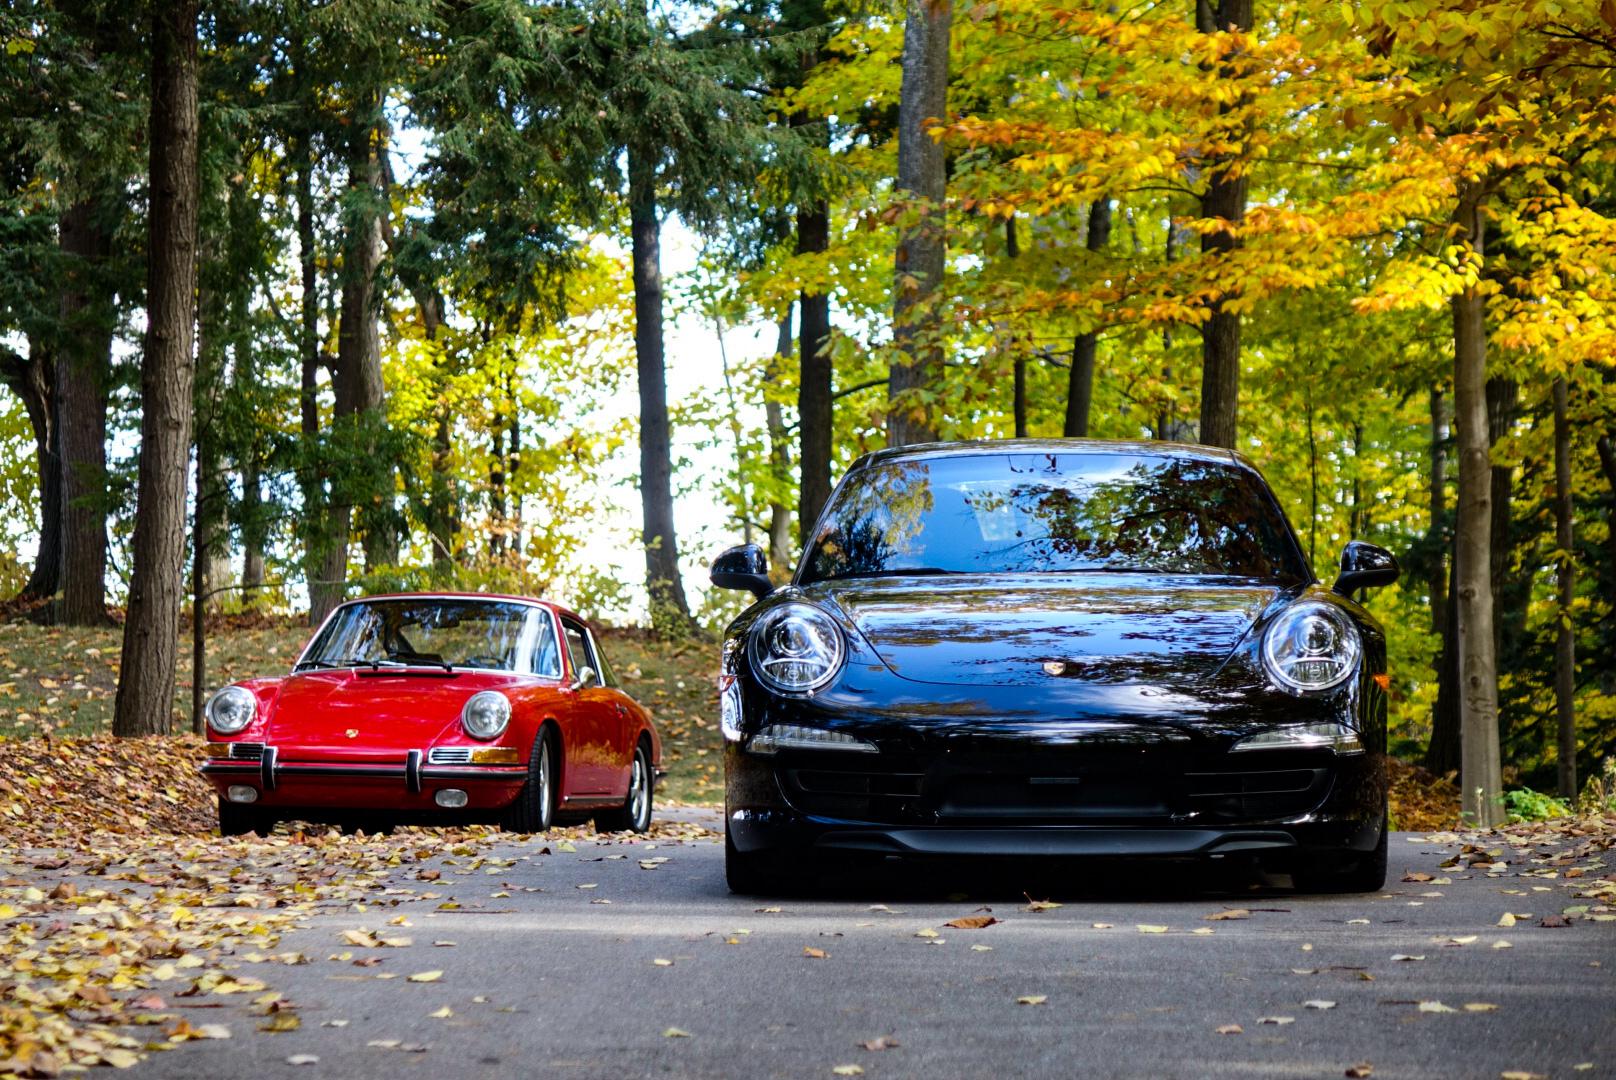 1967 Porsche 911S and 2013 Porsche 911 Carrera 4S front